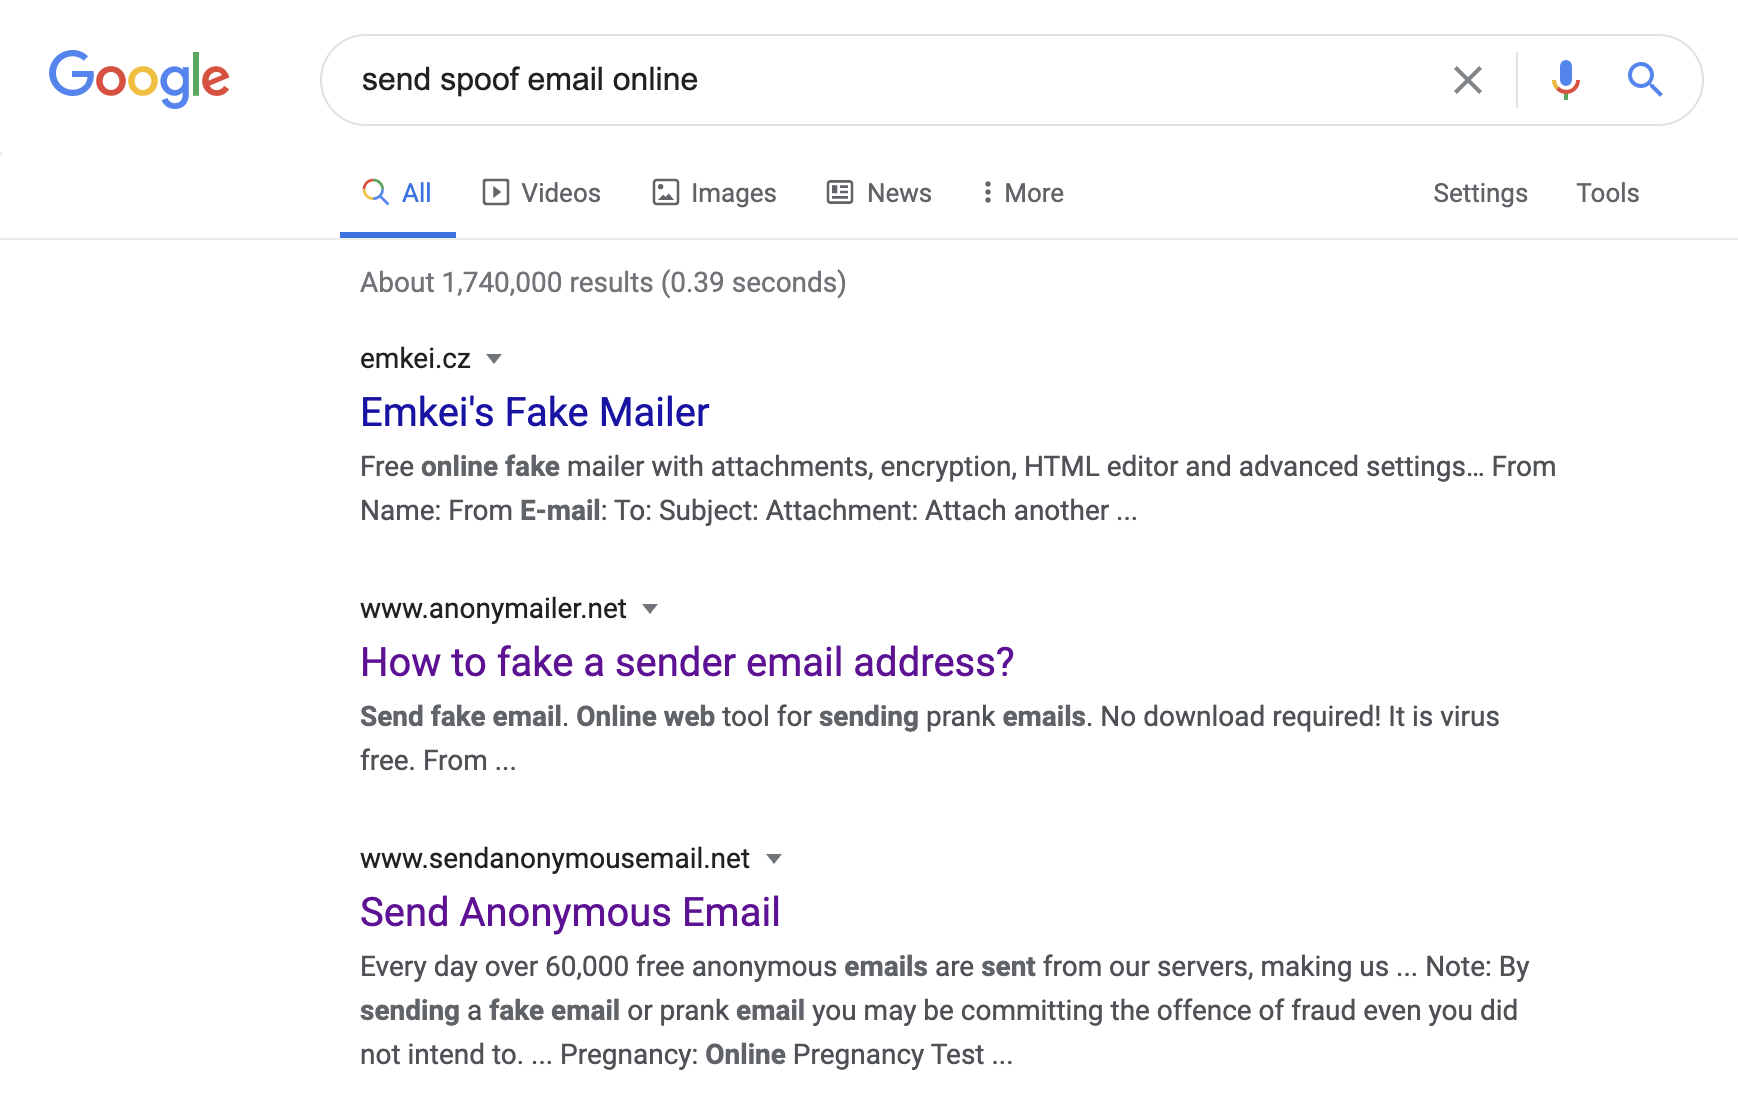 DKIM چیست؟ جلوگیری از حقههای ایمیلی علیه شما